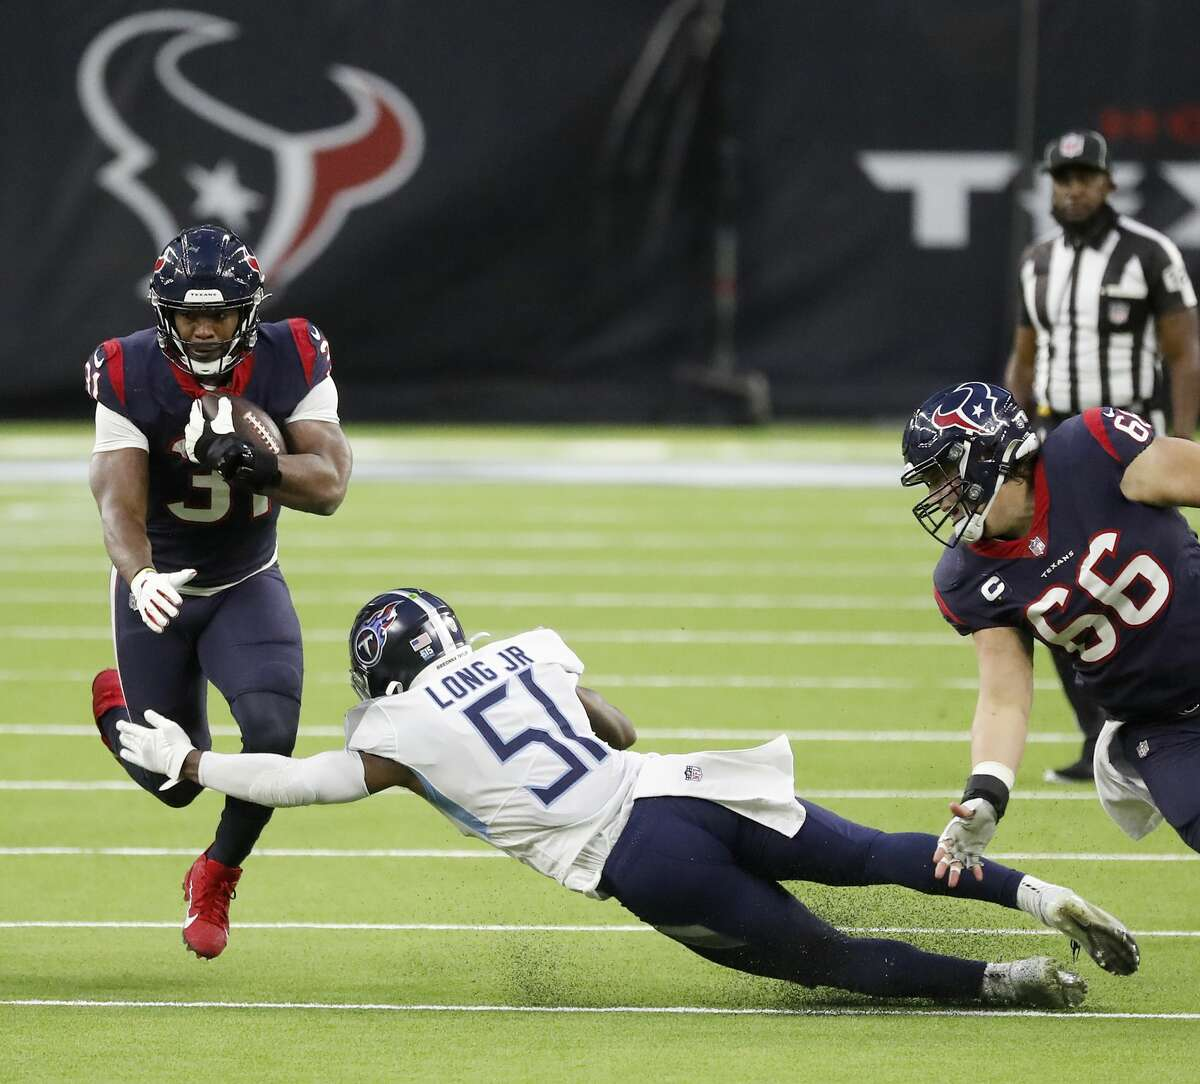 Houston Texans running back David Johnson (31) gains yardage as Tennessee Titans linebacker David Long (51) during the third quarter of an NFL football game Sunday, Jan. 3, 2021, at NRG Stadium in Houston .